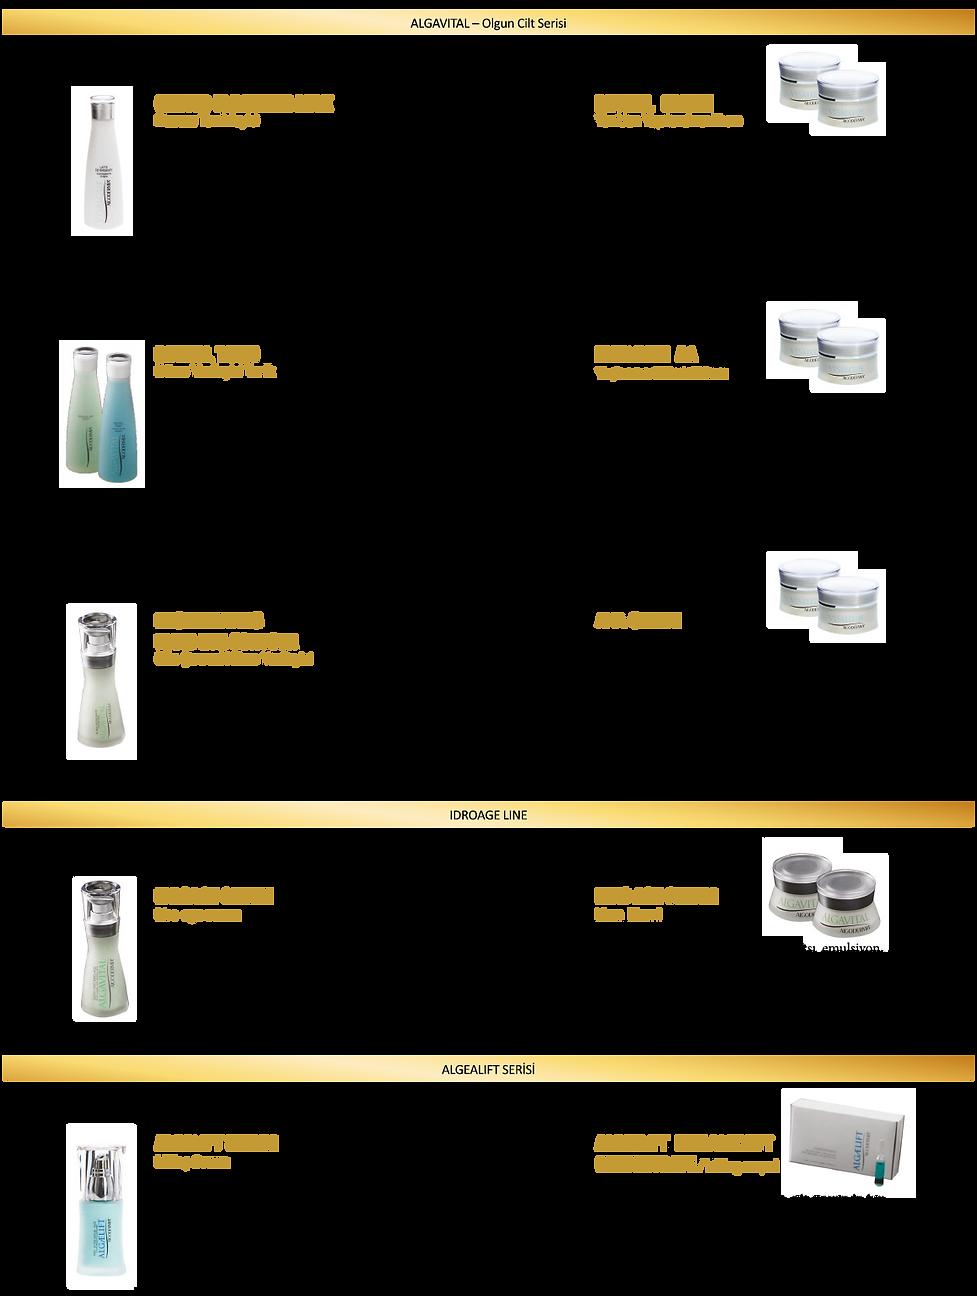 algodermia_katalog-05.png